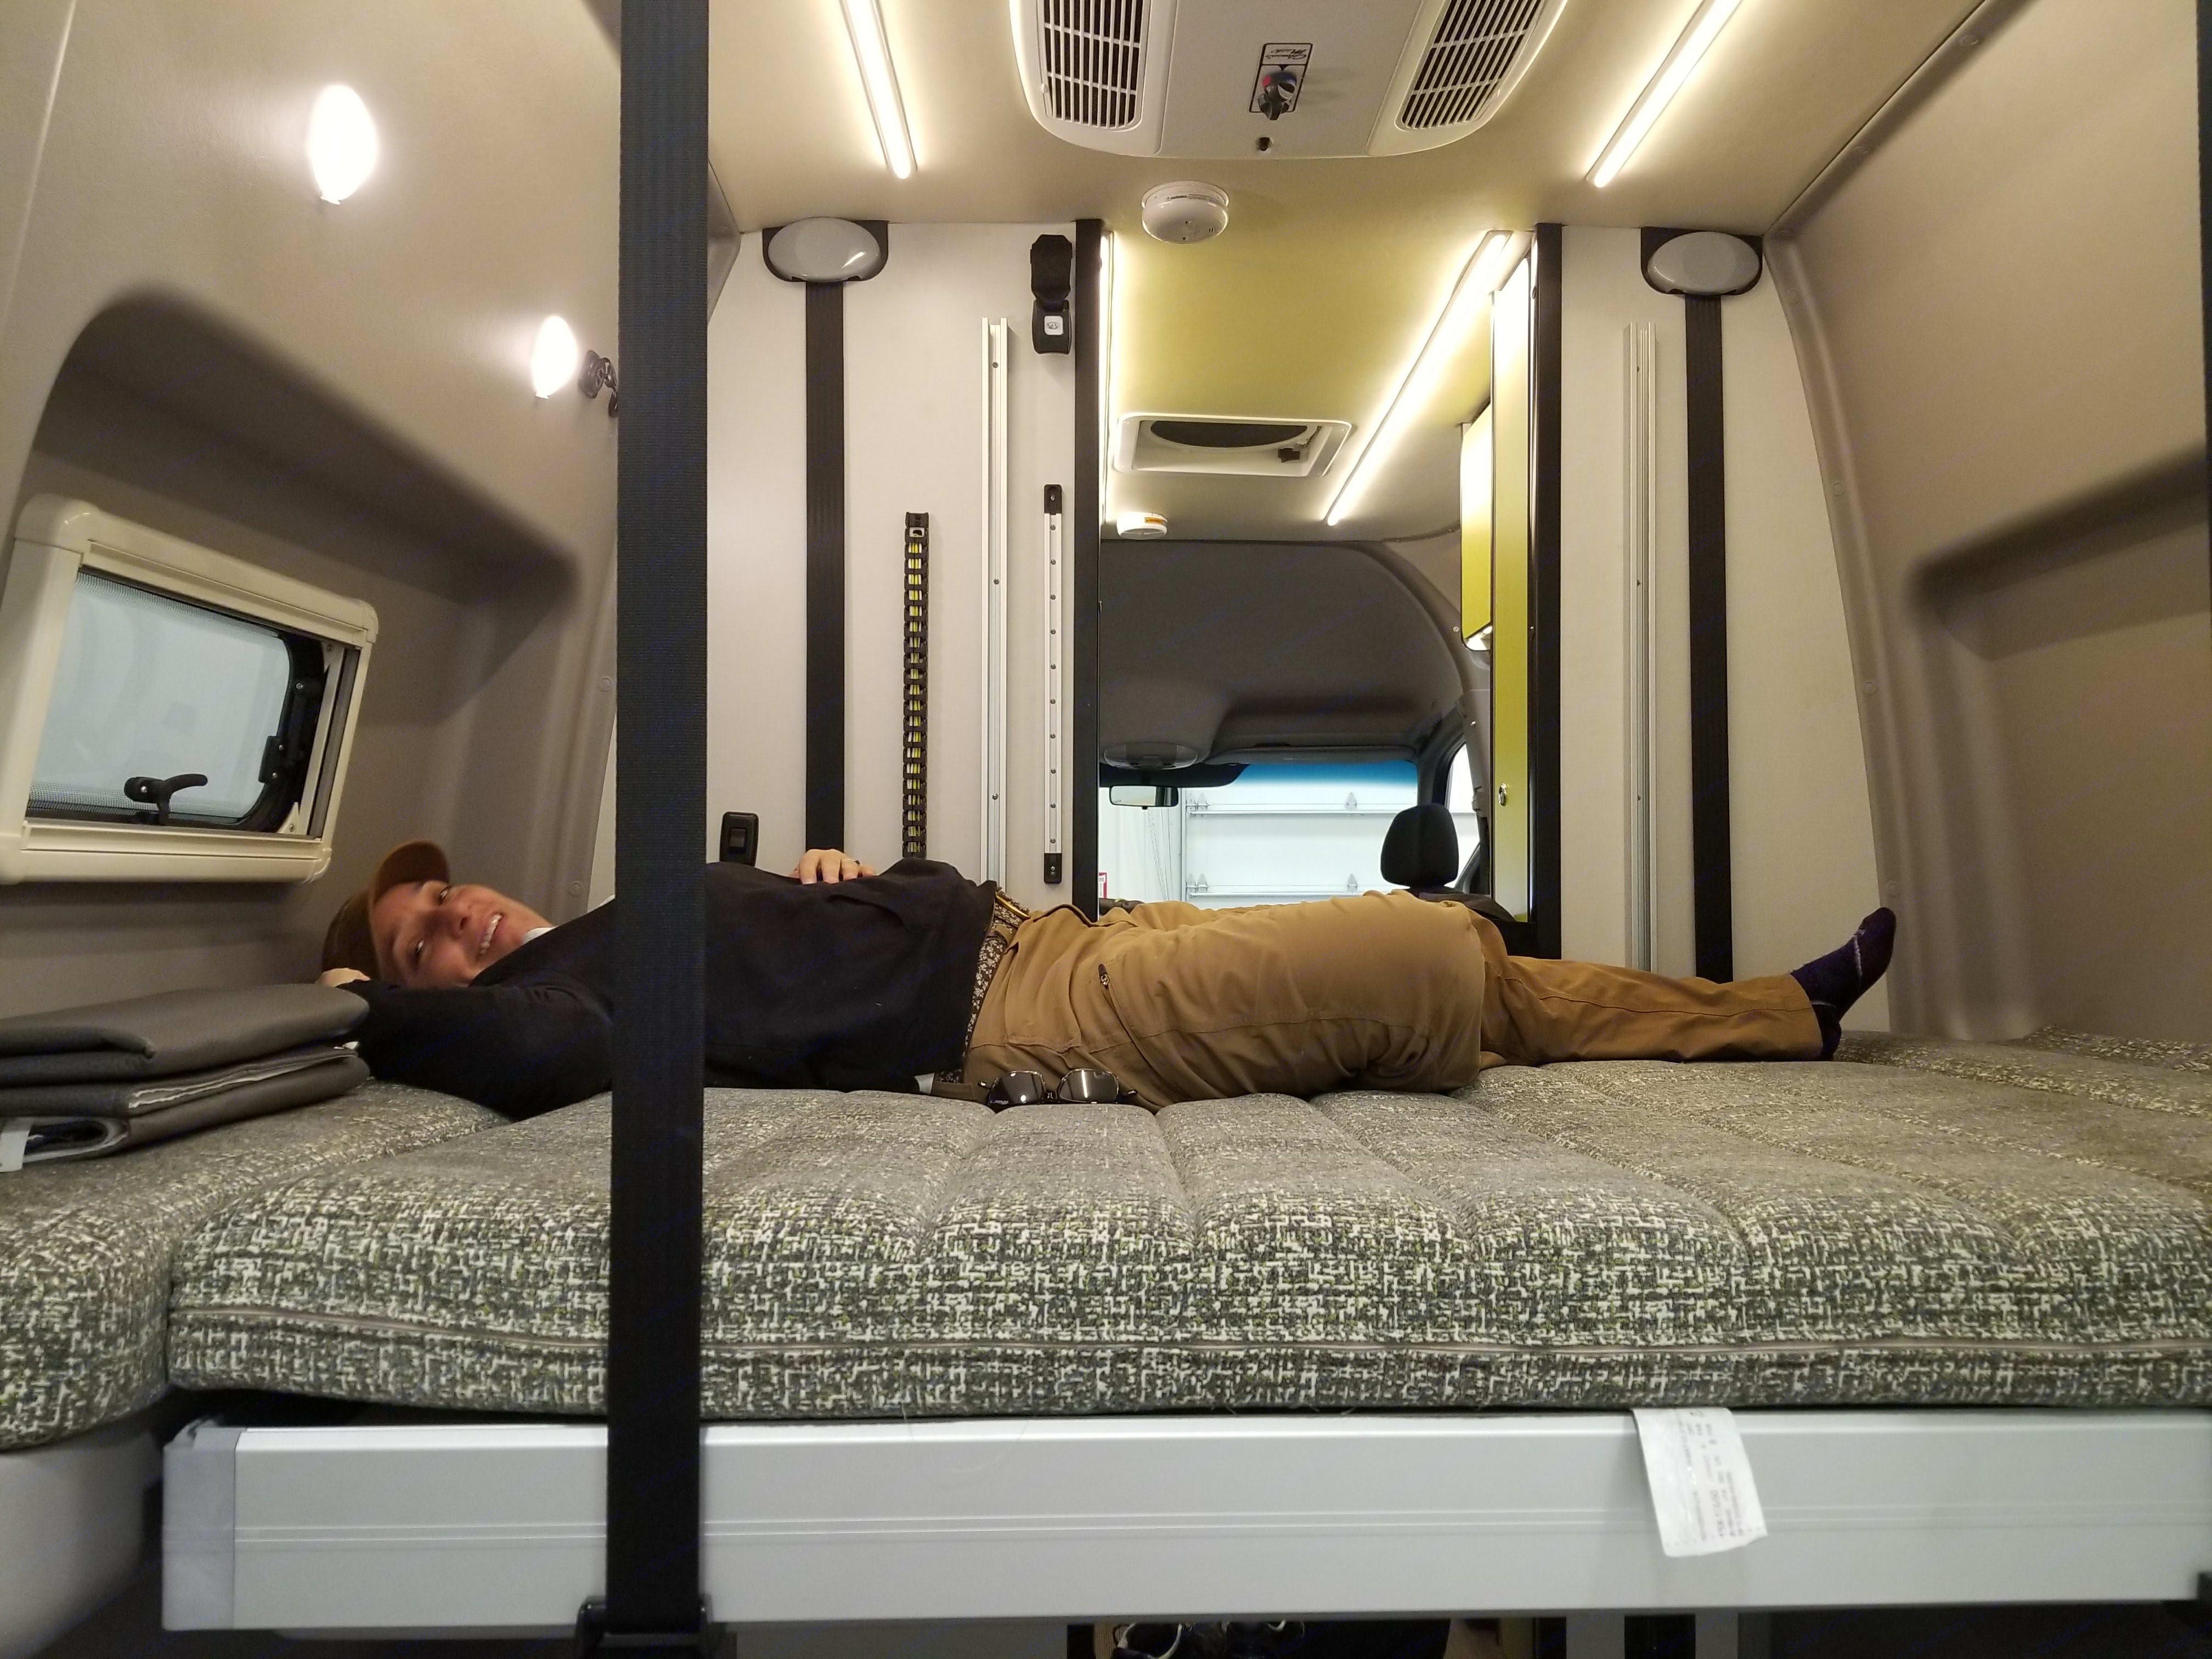 "Comfortably sleeps up 6'3"". Mercedes-Benz Sprinter RV Motorhome Campervan 2019"